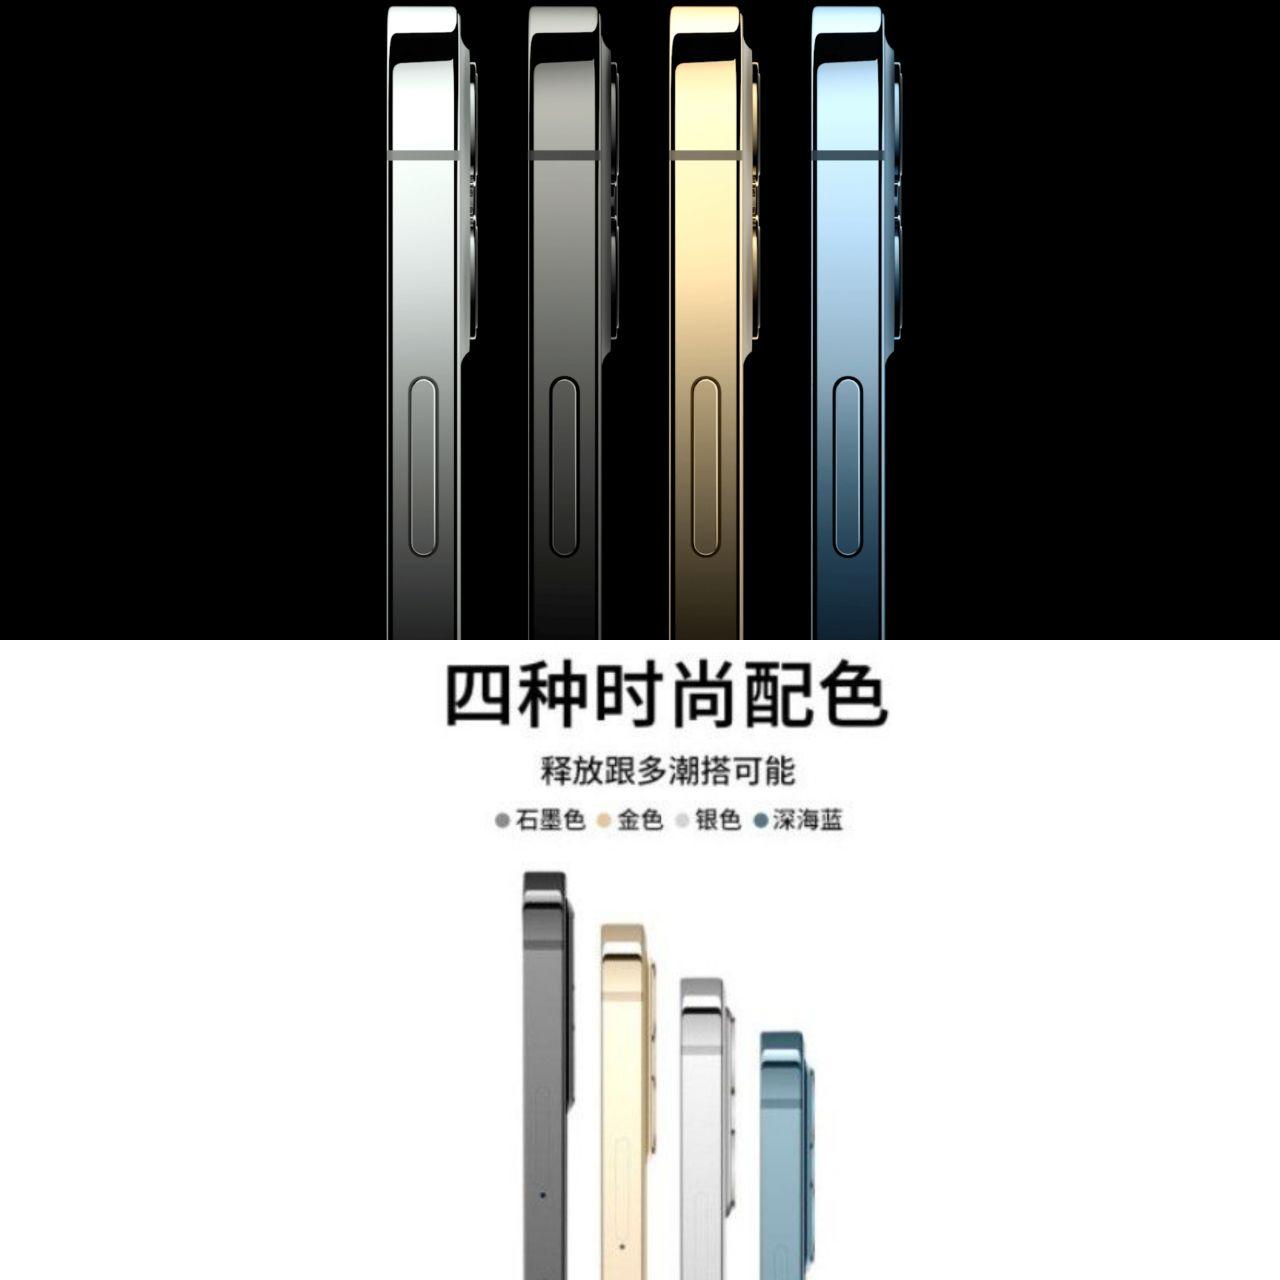 مقایسه پوستر تبلیغاتی Koobee و اپل